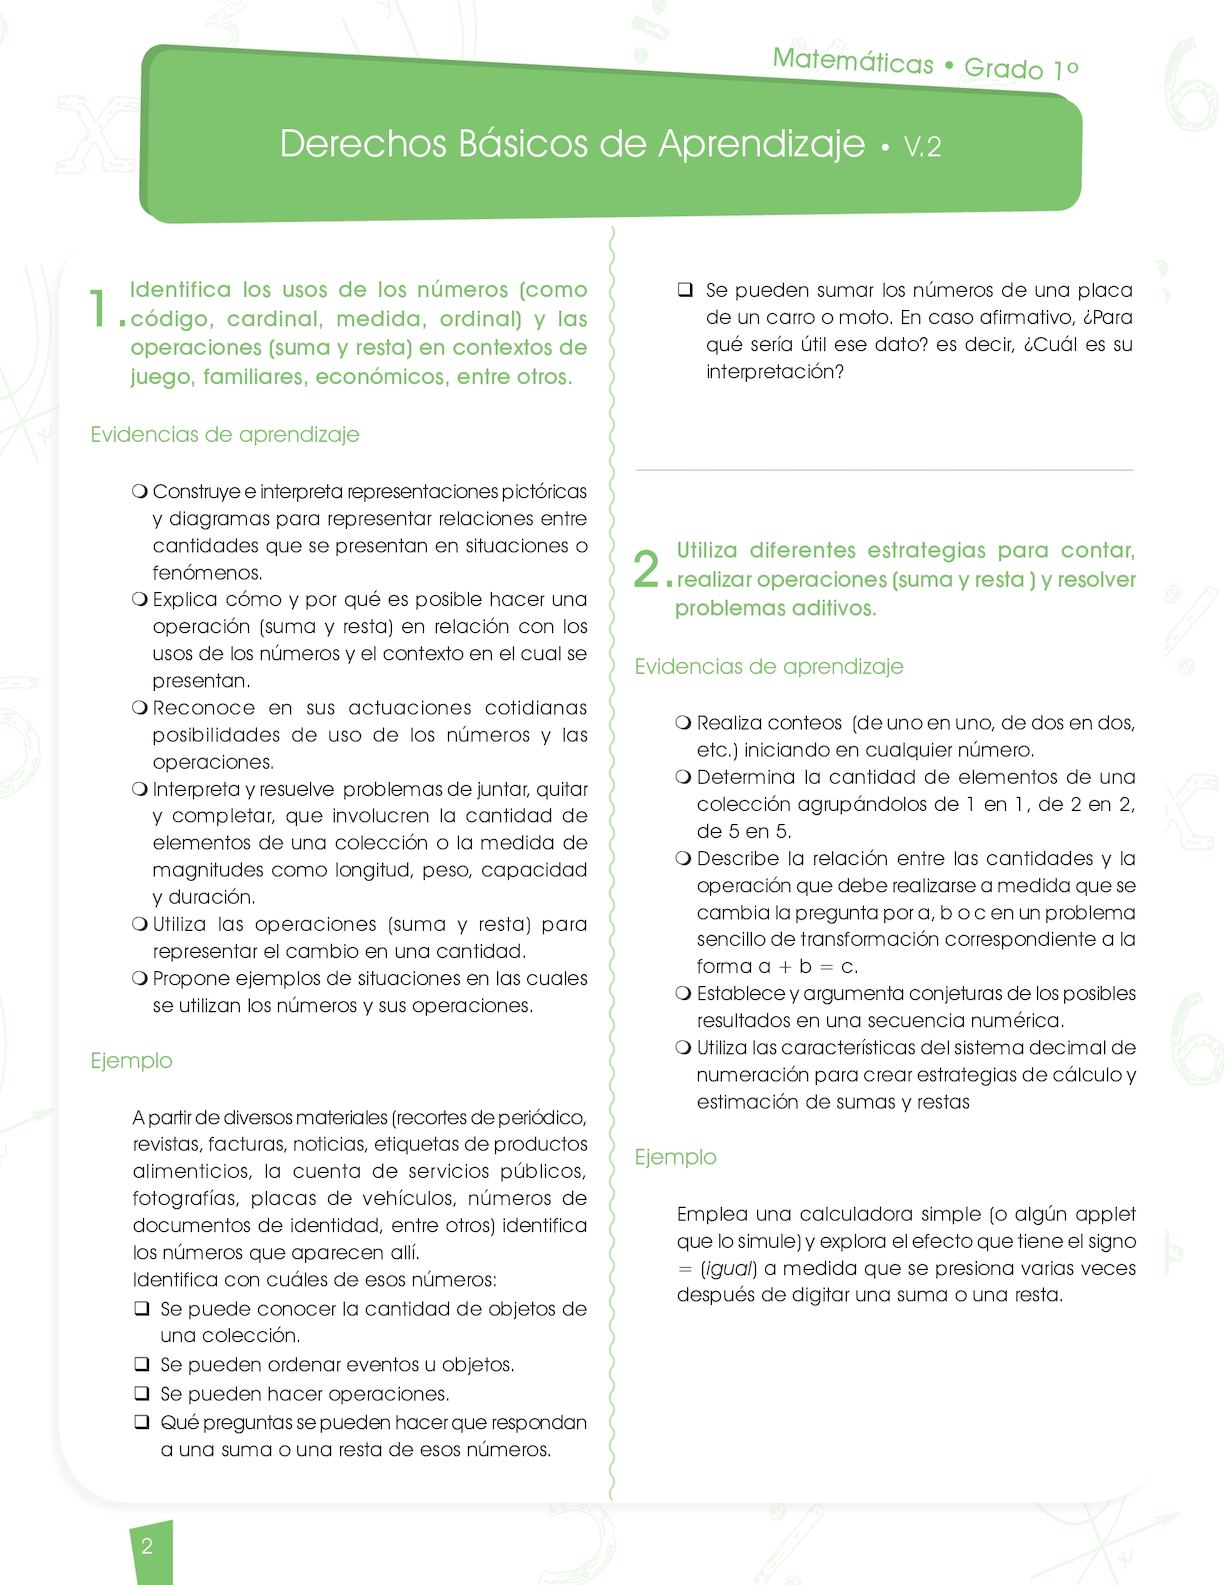 Calaméo - DBA MATEMATICA. VERSION 2